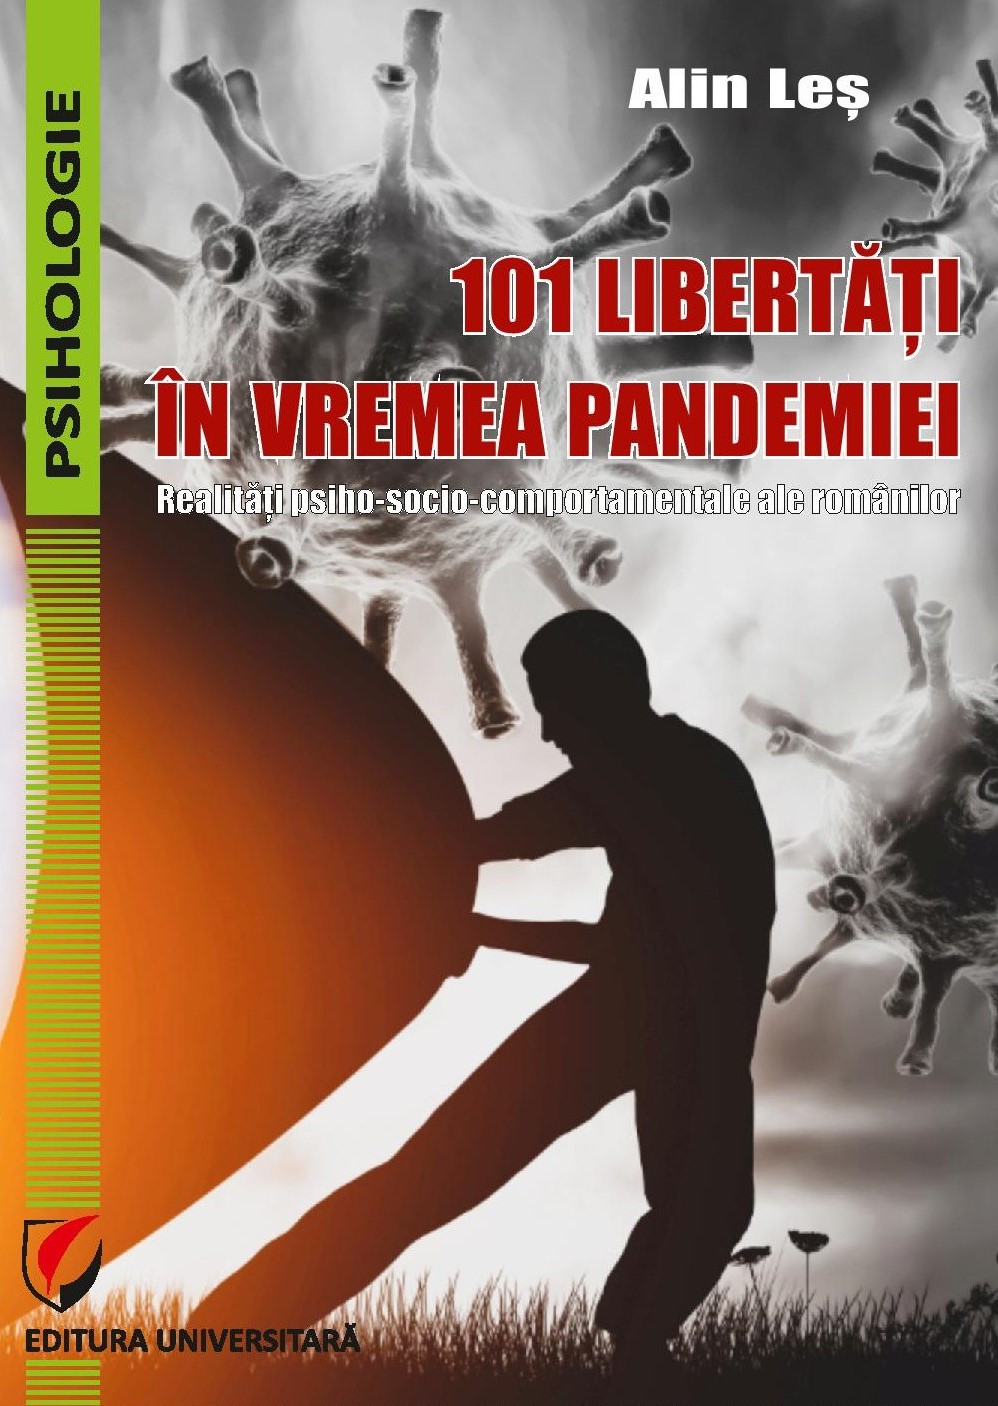 les-alin_101-libertati-in-pandemie_varianta-finala